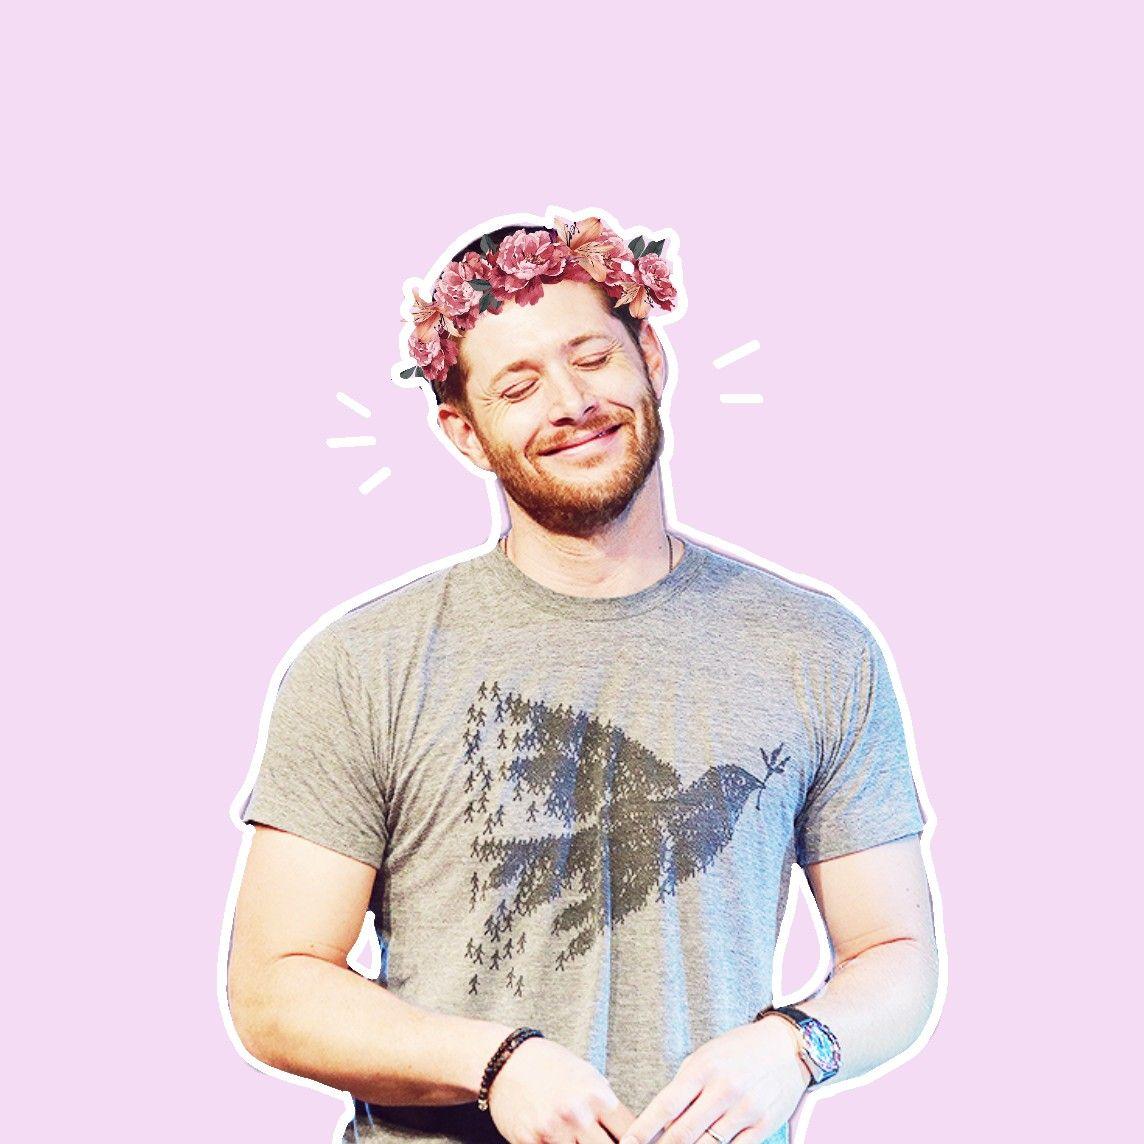 Jensen ackles with flower crown my first edit by picsart spn jensen ackles with flower crown my first edit by picsart spn spnedit supernatural jensenackles izmirmasajfo